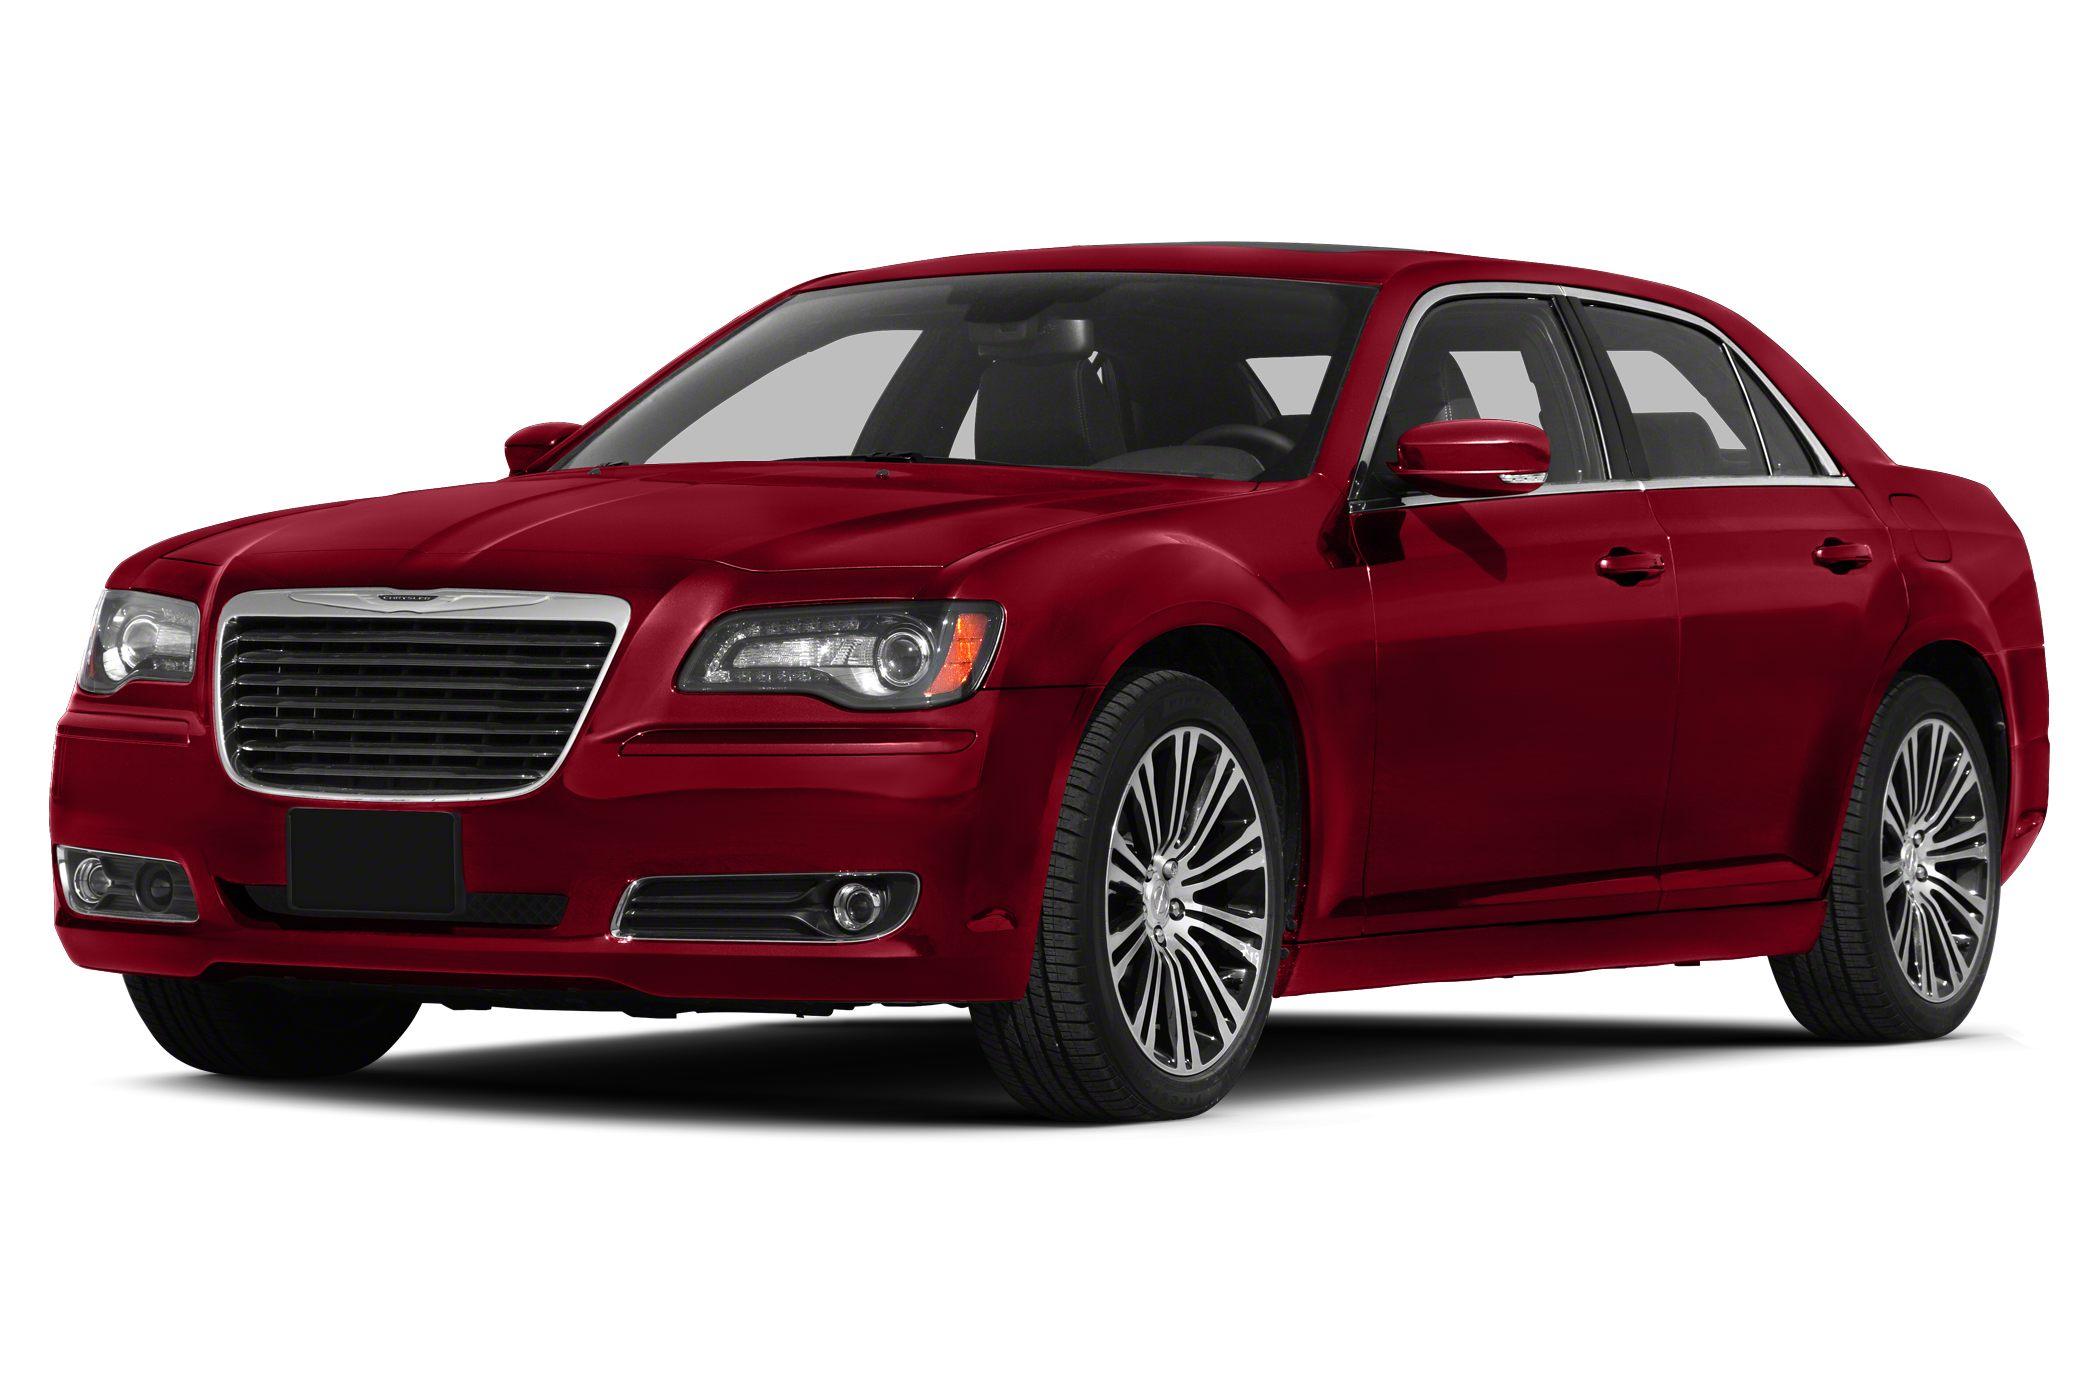 2013 Chrysler 300 S Sedan for sale in Longmont for $0 with 19,956 miles